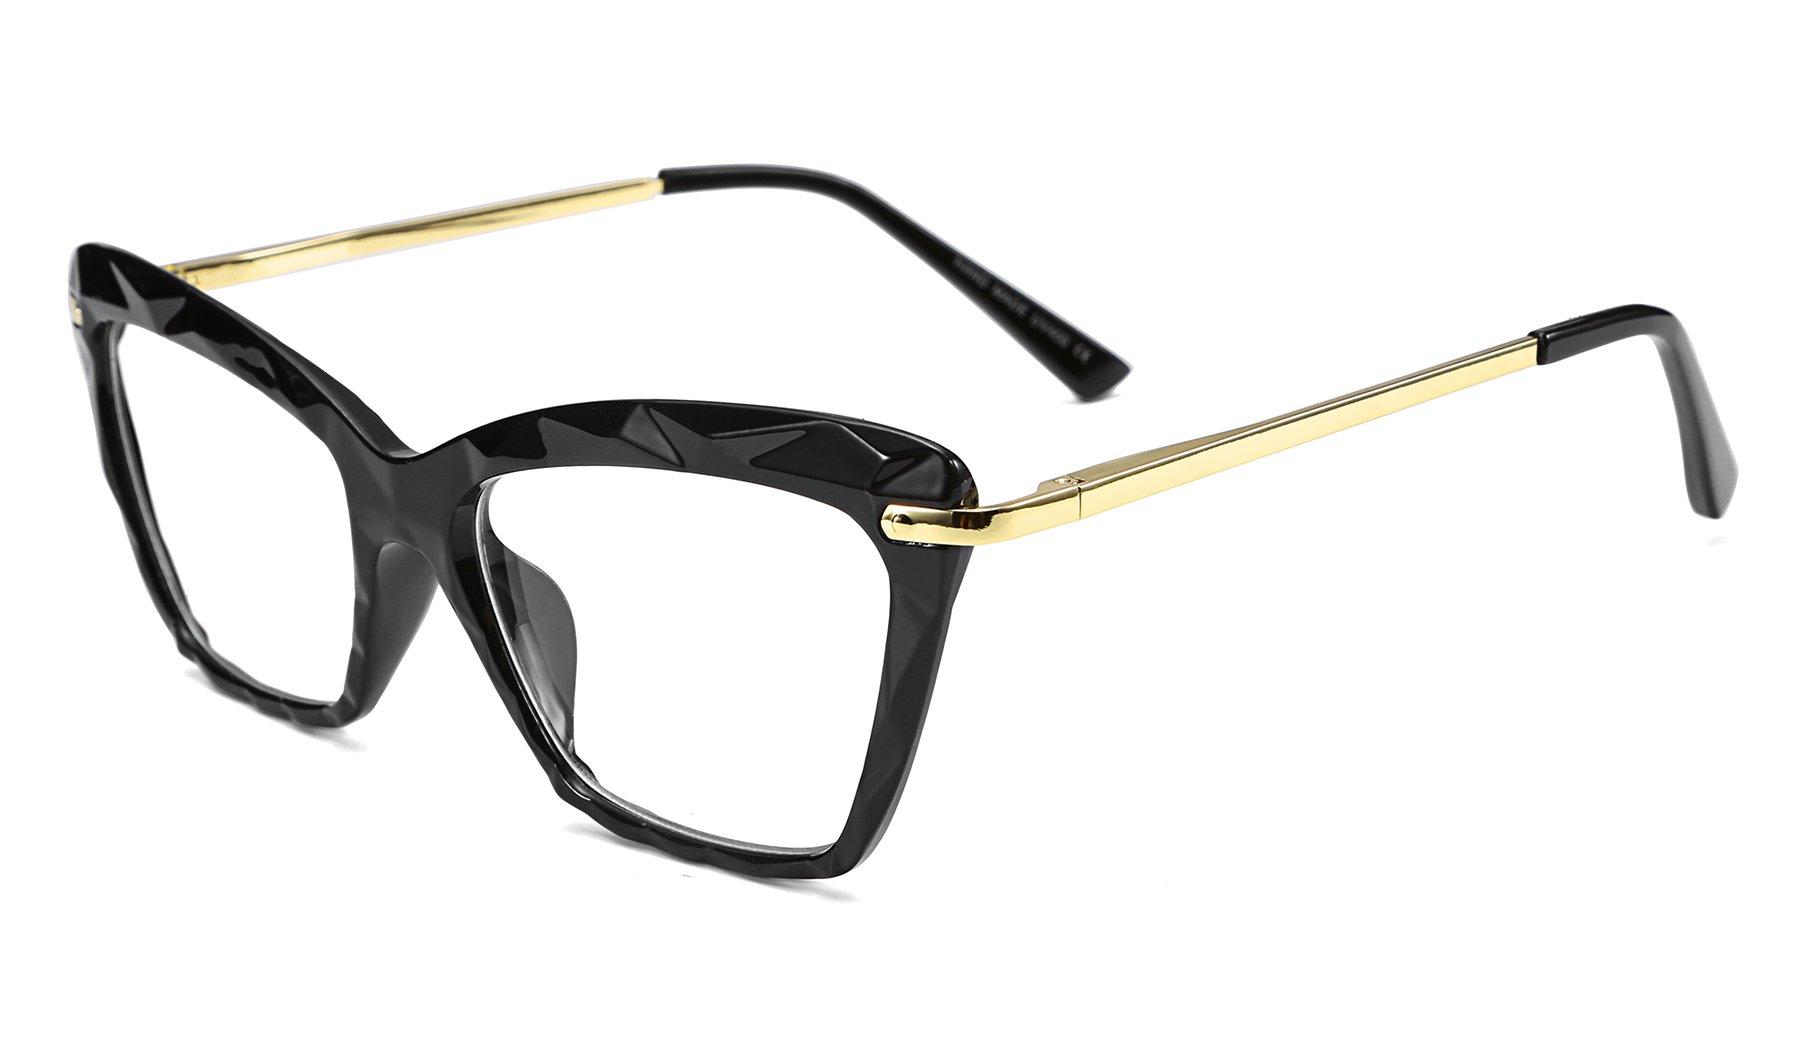 FEISEDY Cateye Crystal Transparent Eyewear Clear Lens Glasses Frame B2440